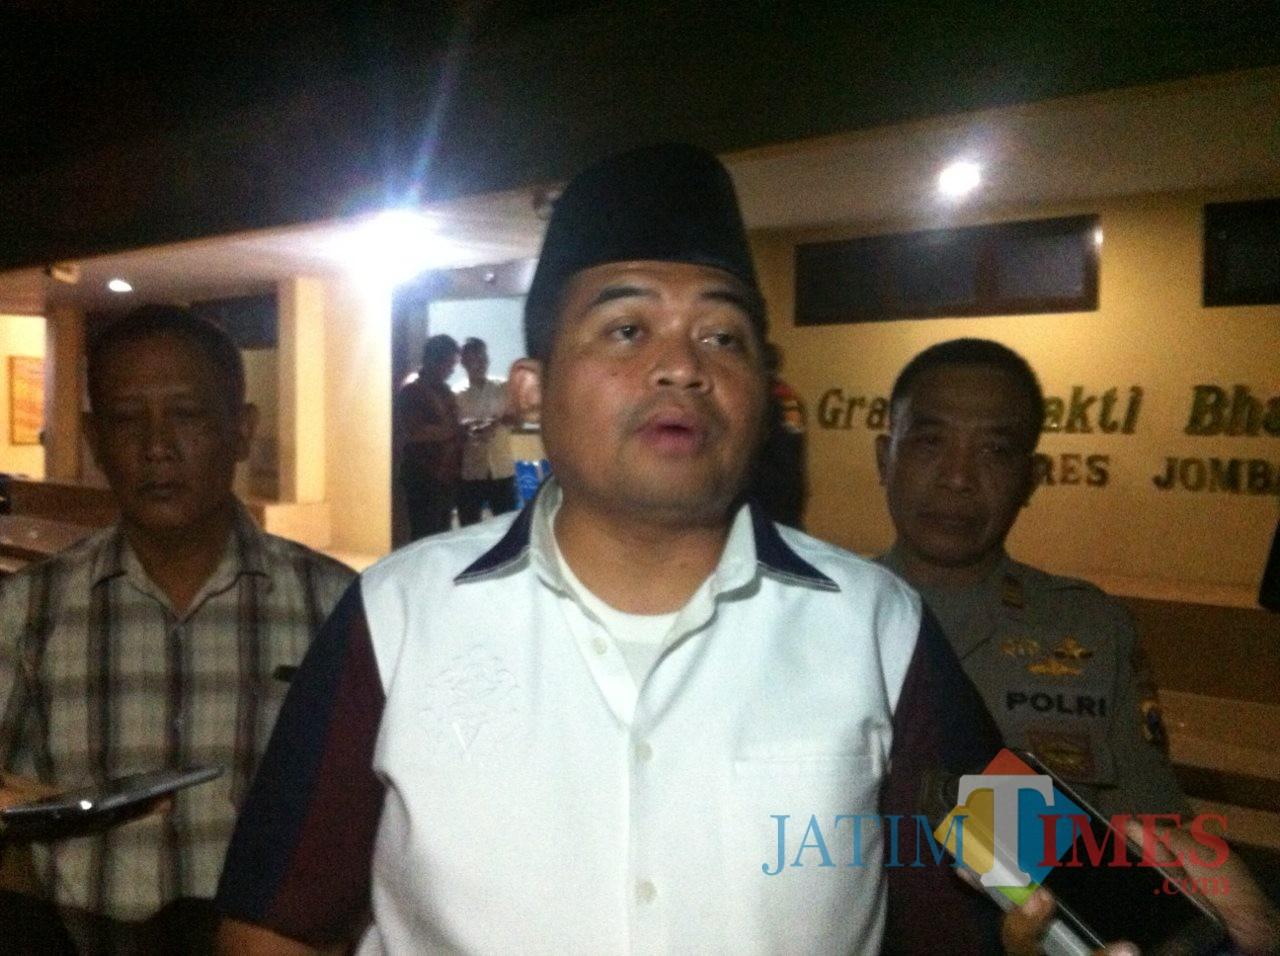 Kapolres Jombang, AKBP Fadli Widiyanto saat diwawancarai sesuai melakukan mediasi bersama keluarga 4 tersangka pengedar pil koplo. (Foto : Adi Rosul / JombangTIMES)